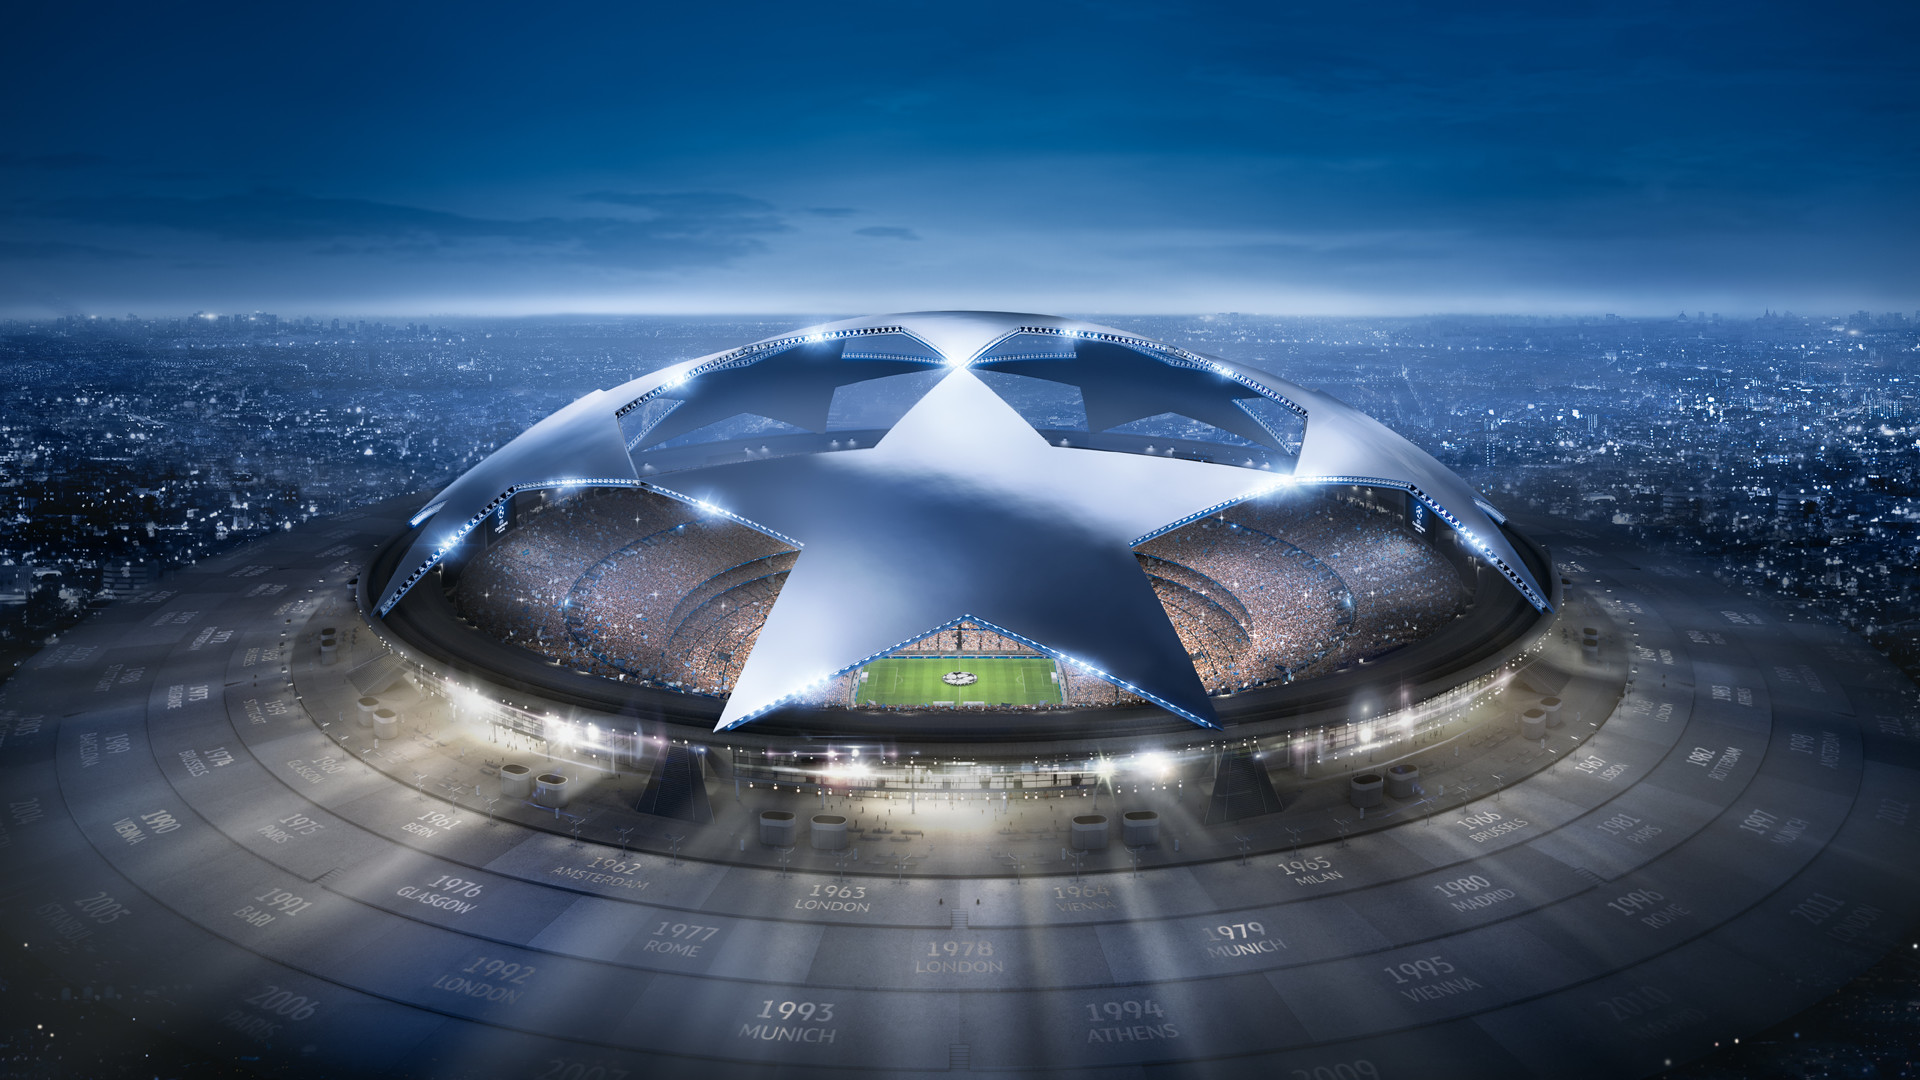 Champions League Wallpaper (67+ Images